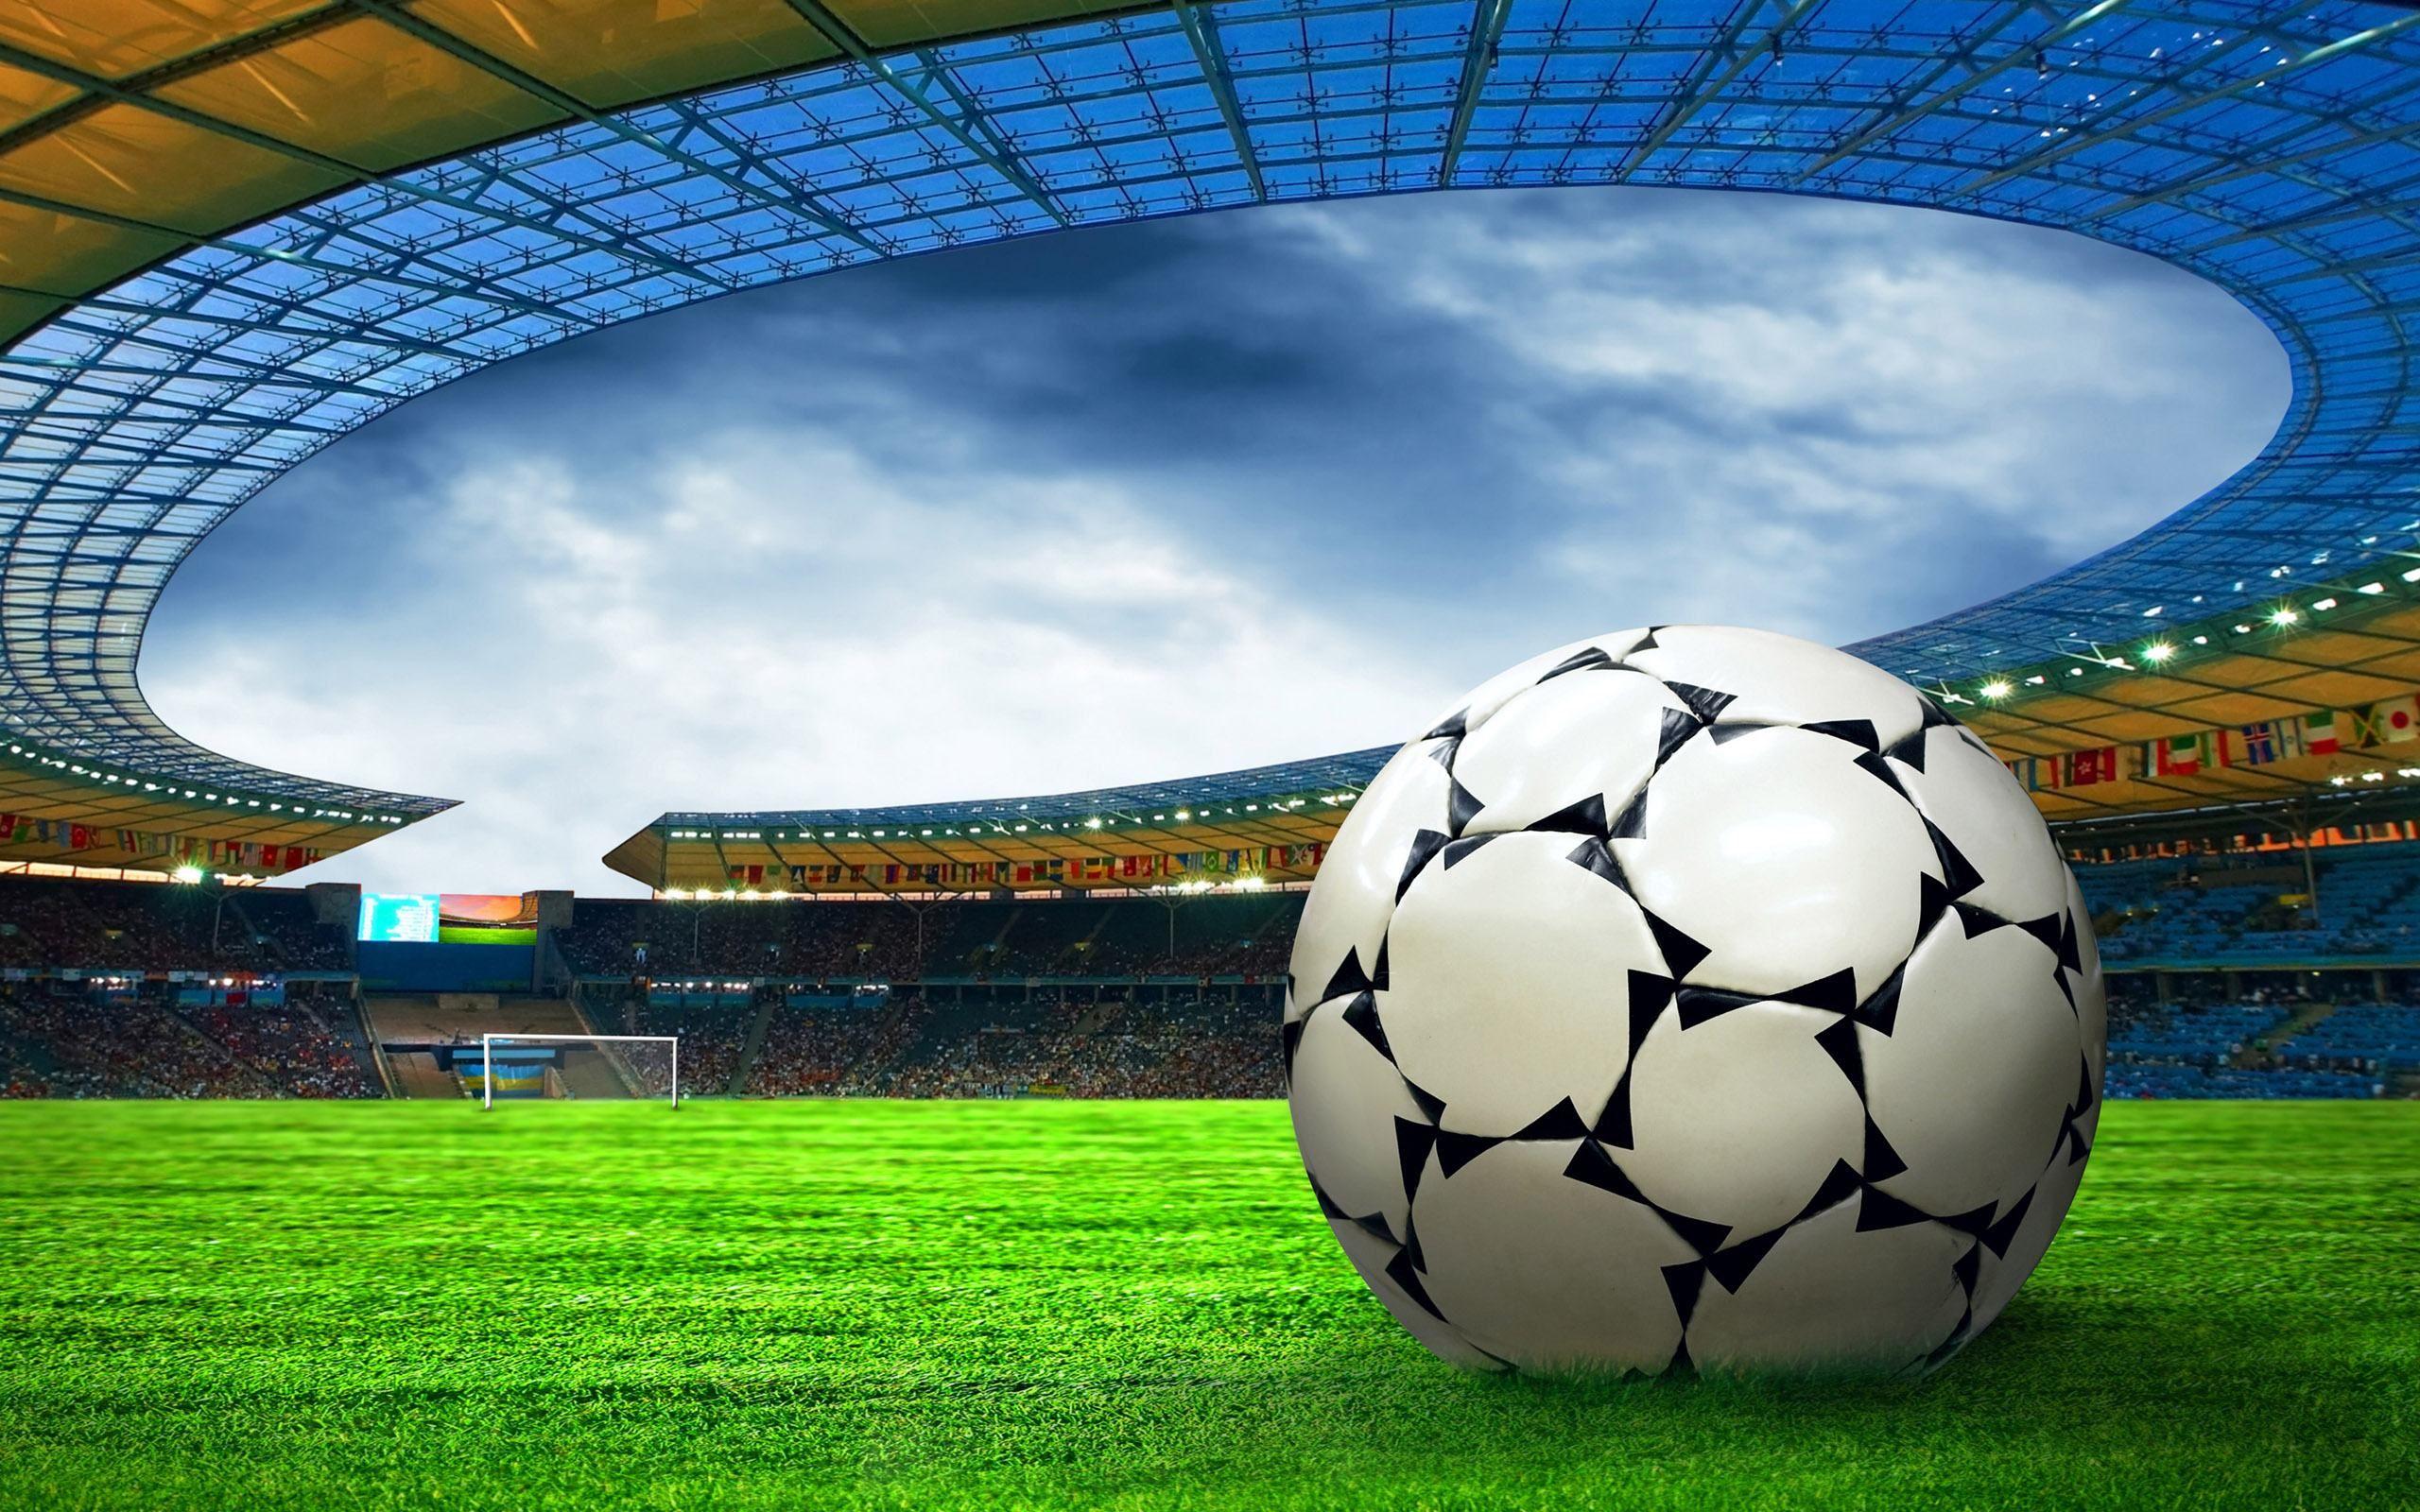 Wallpaper backgrounds soccer stadium wallpaper estadio for Fondos de pantalla de futbol para celular